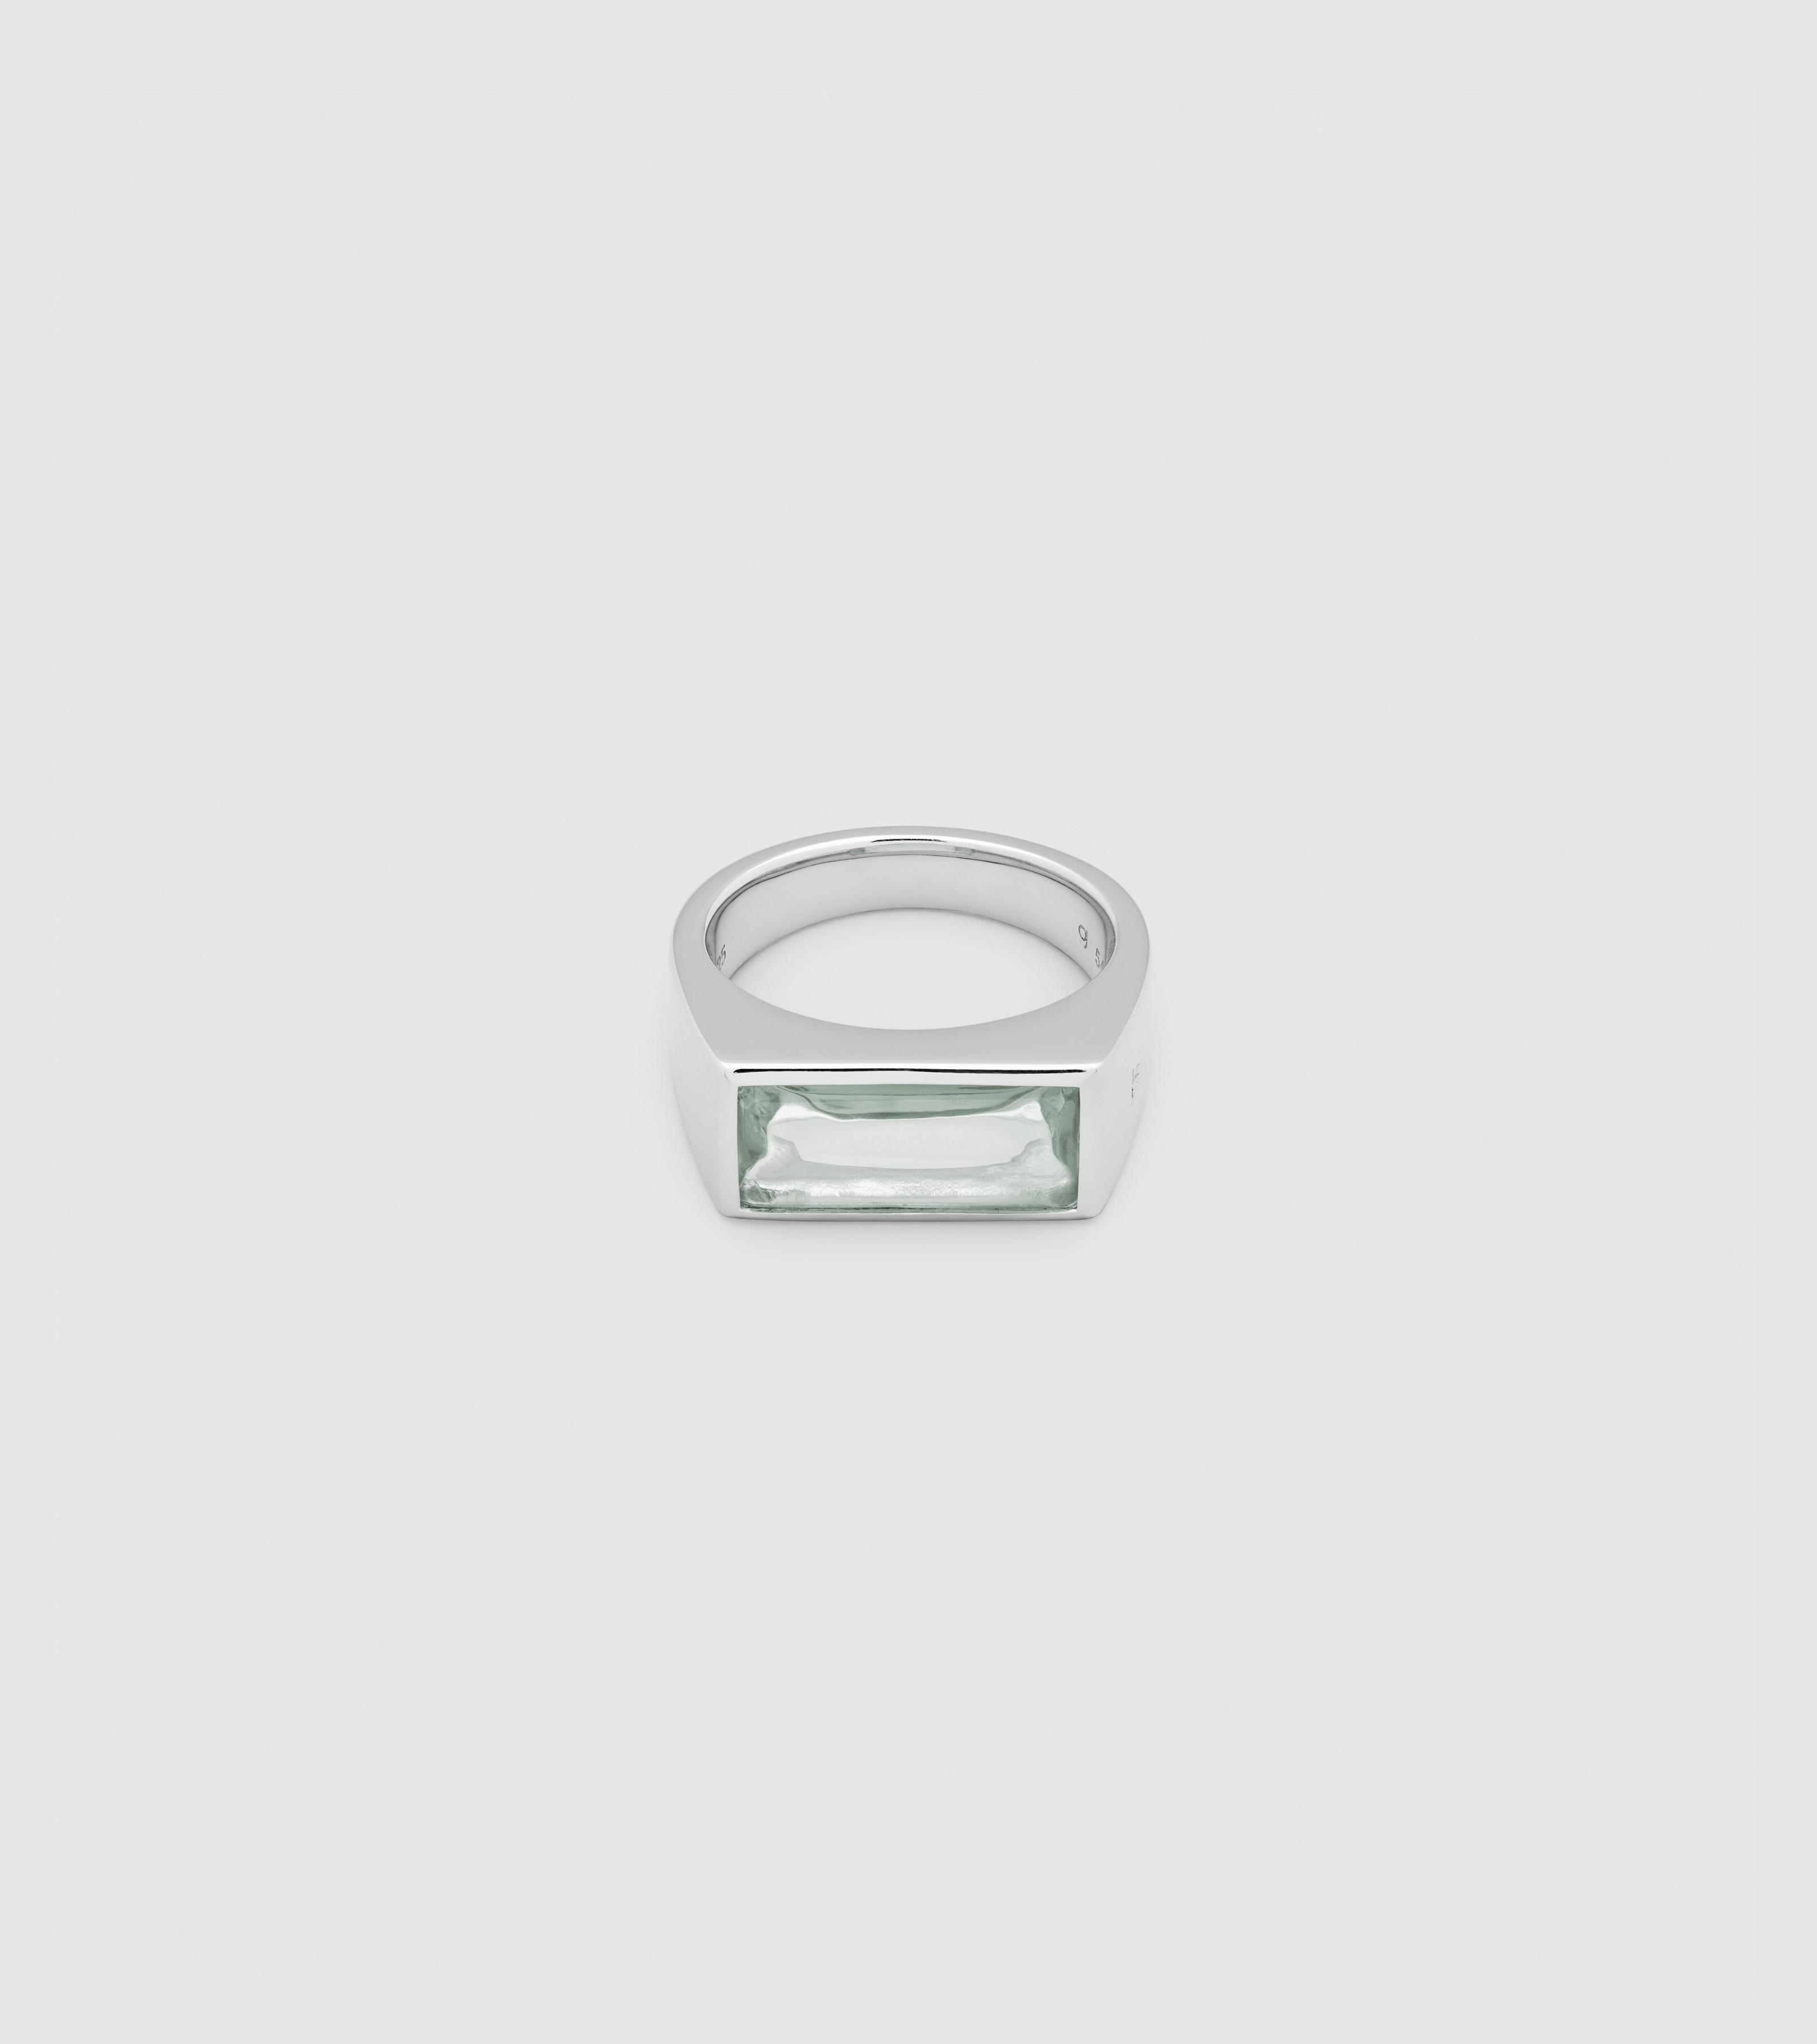 Peaky Ring Green Quartz